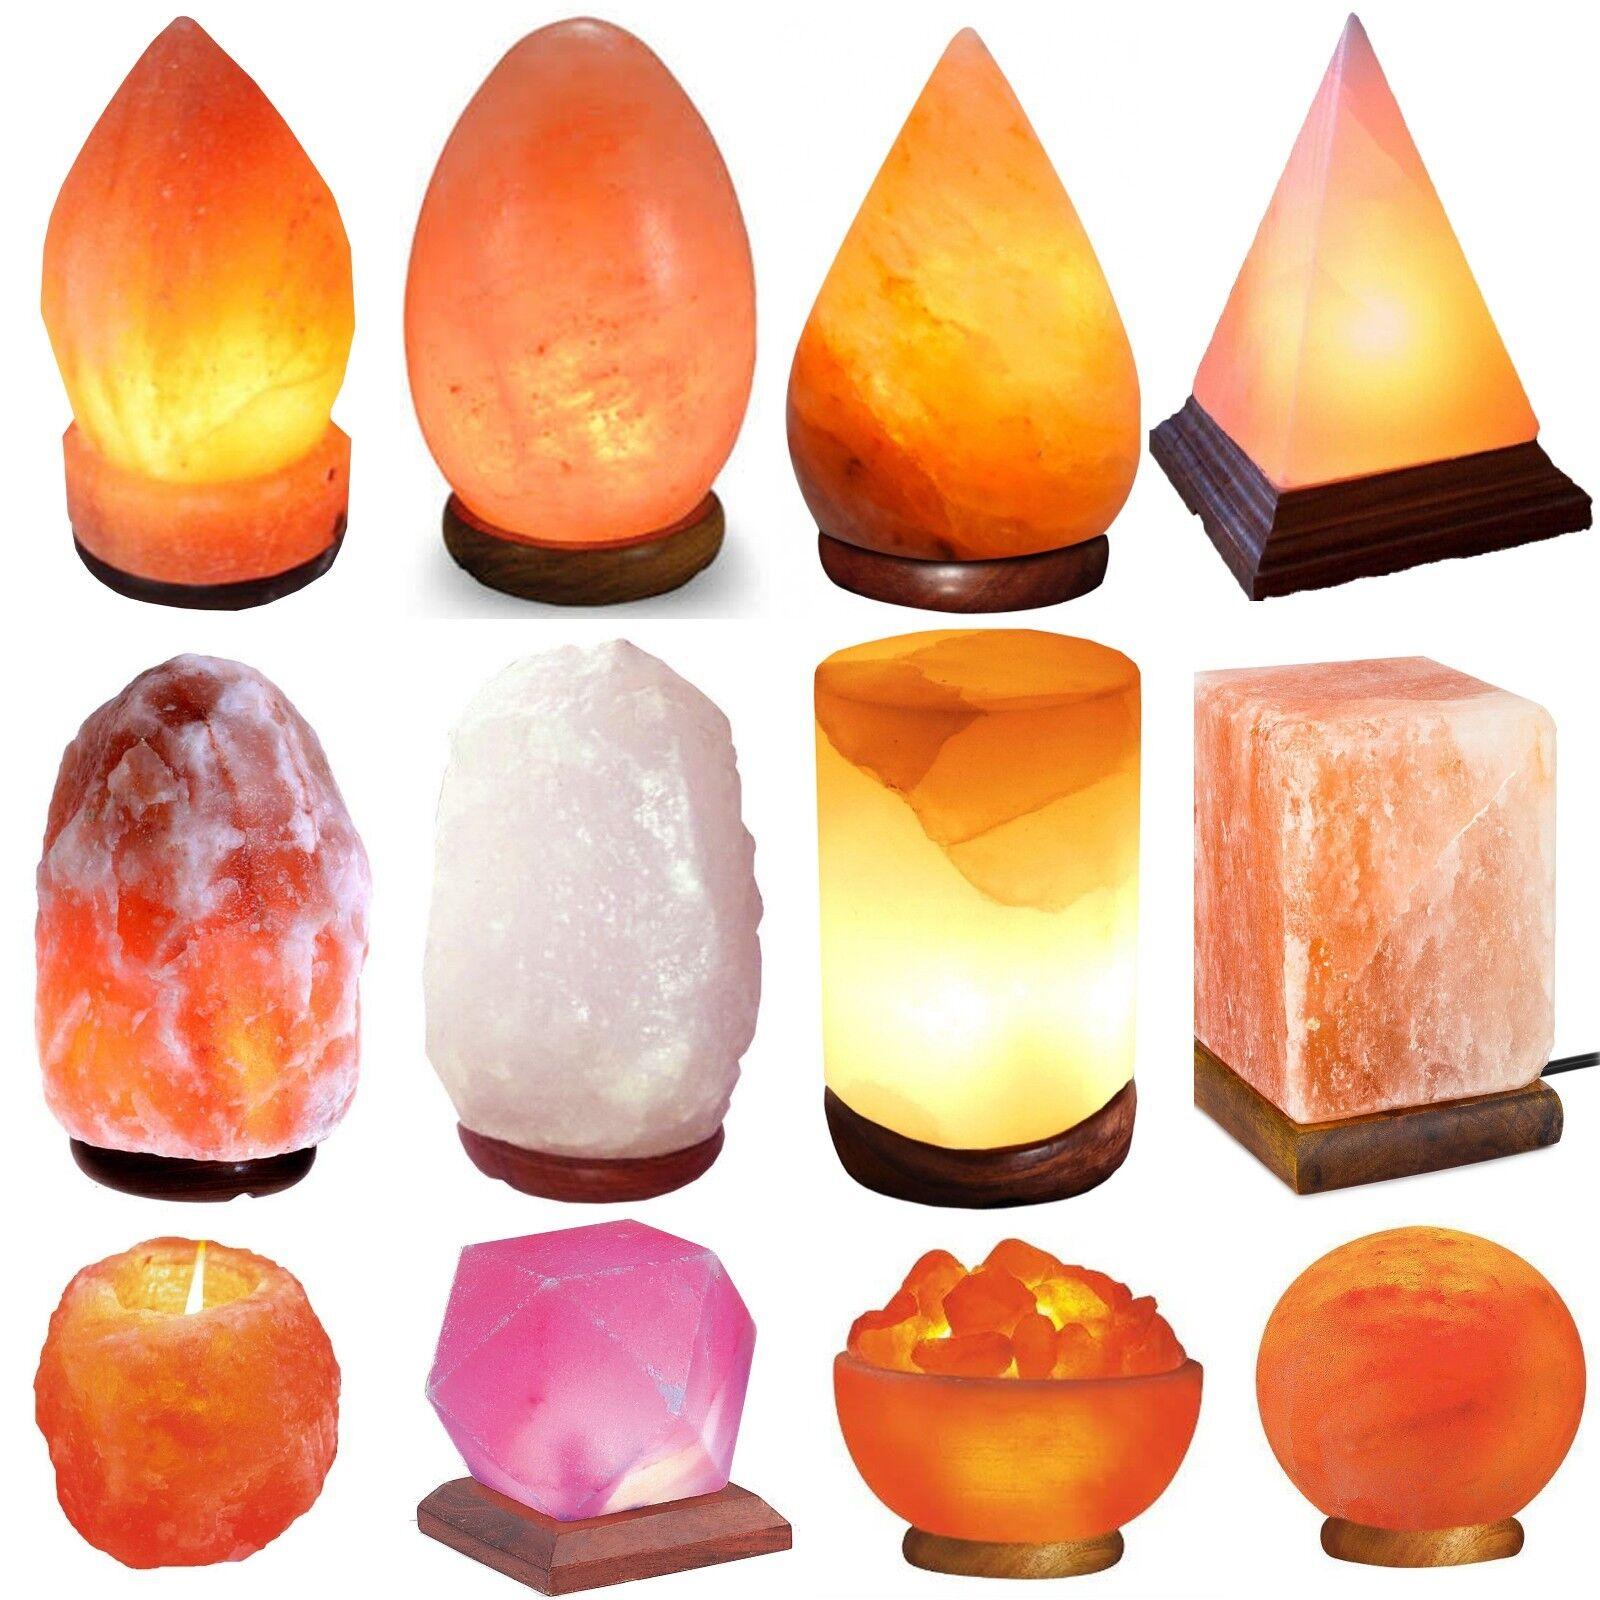 Salt Size Lamp about Orange Rock Details HIMALAYAN Different Plug Pink With NATURAL Bulb lwXiuOPkZT